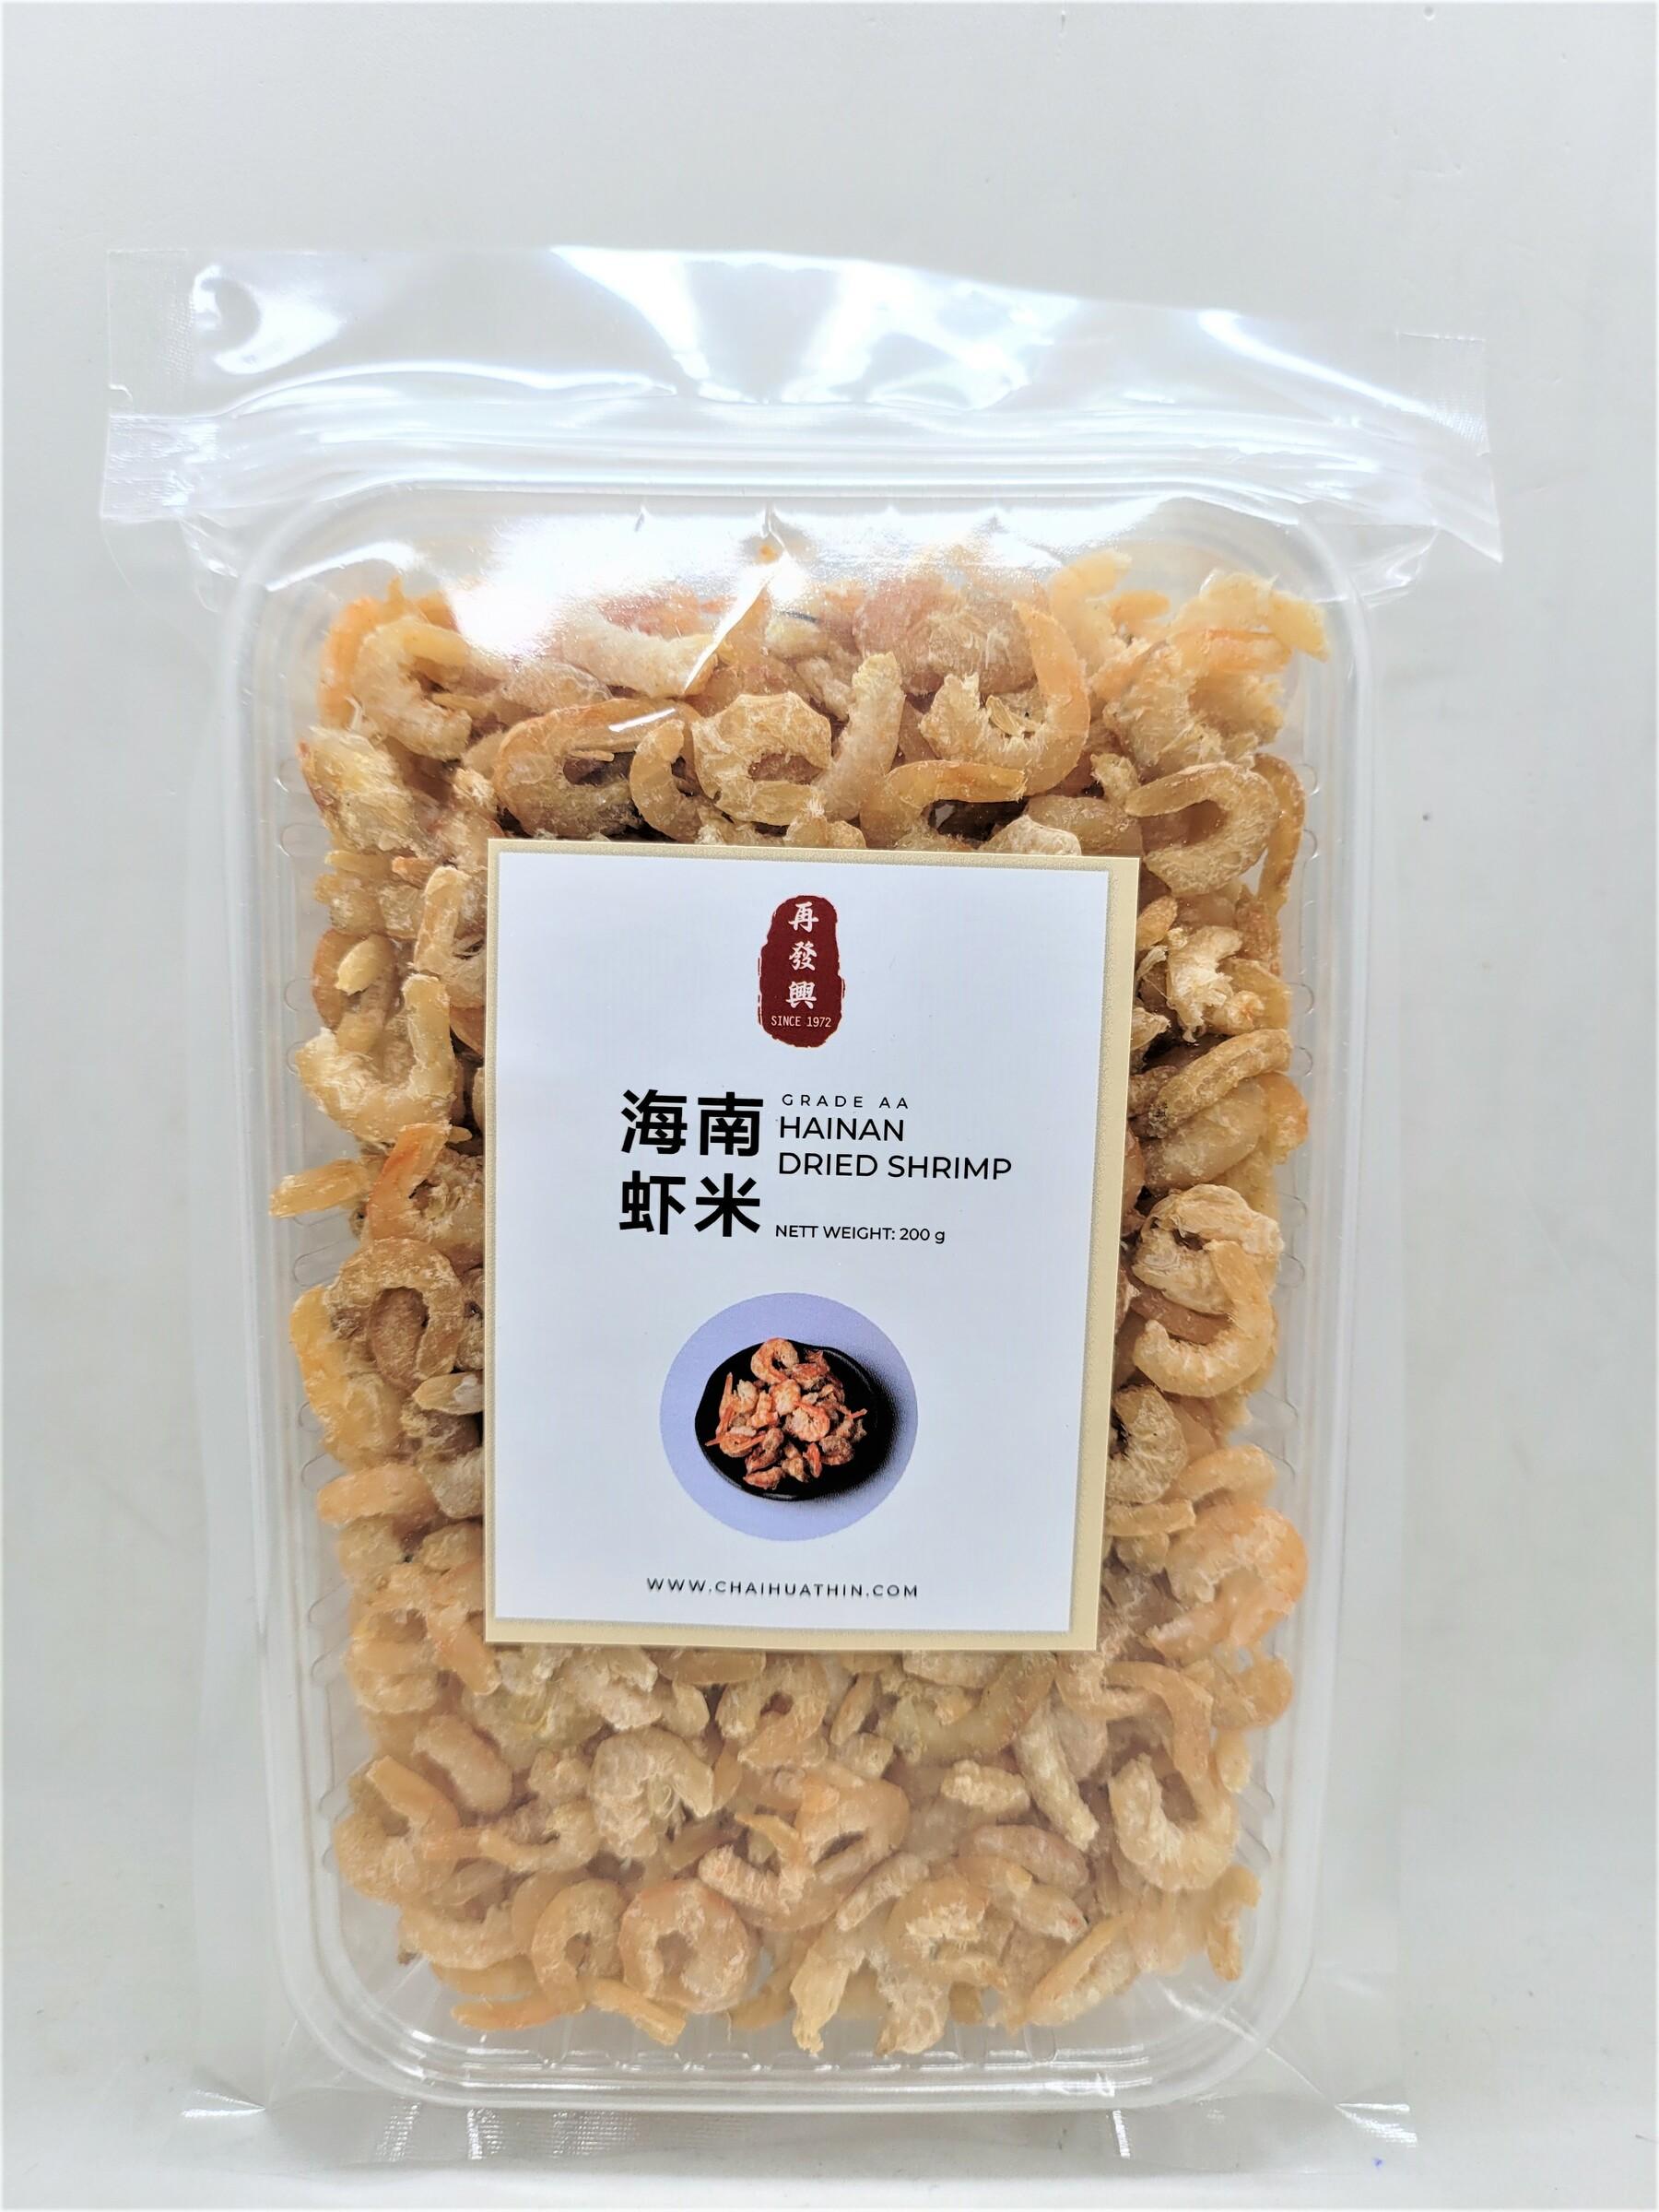 hainan AA dried shrimp.jpg